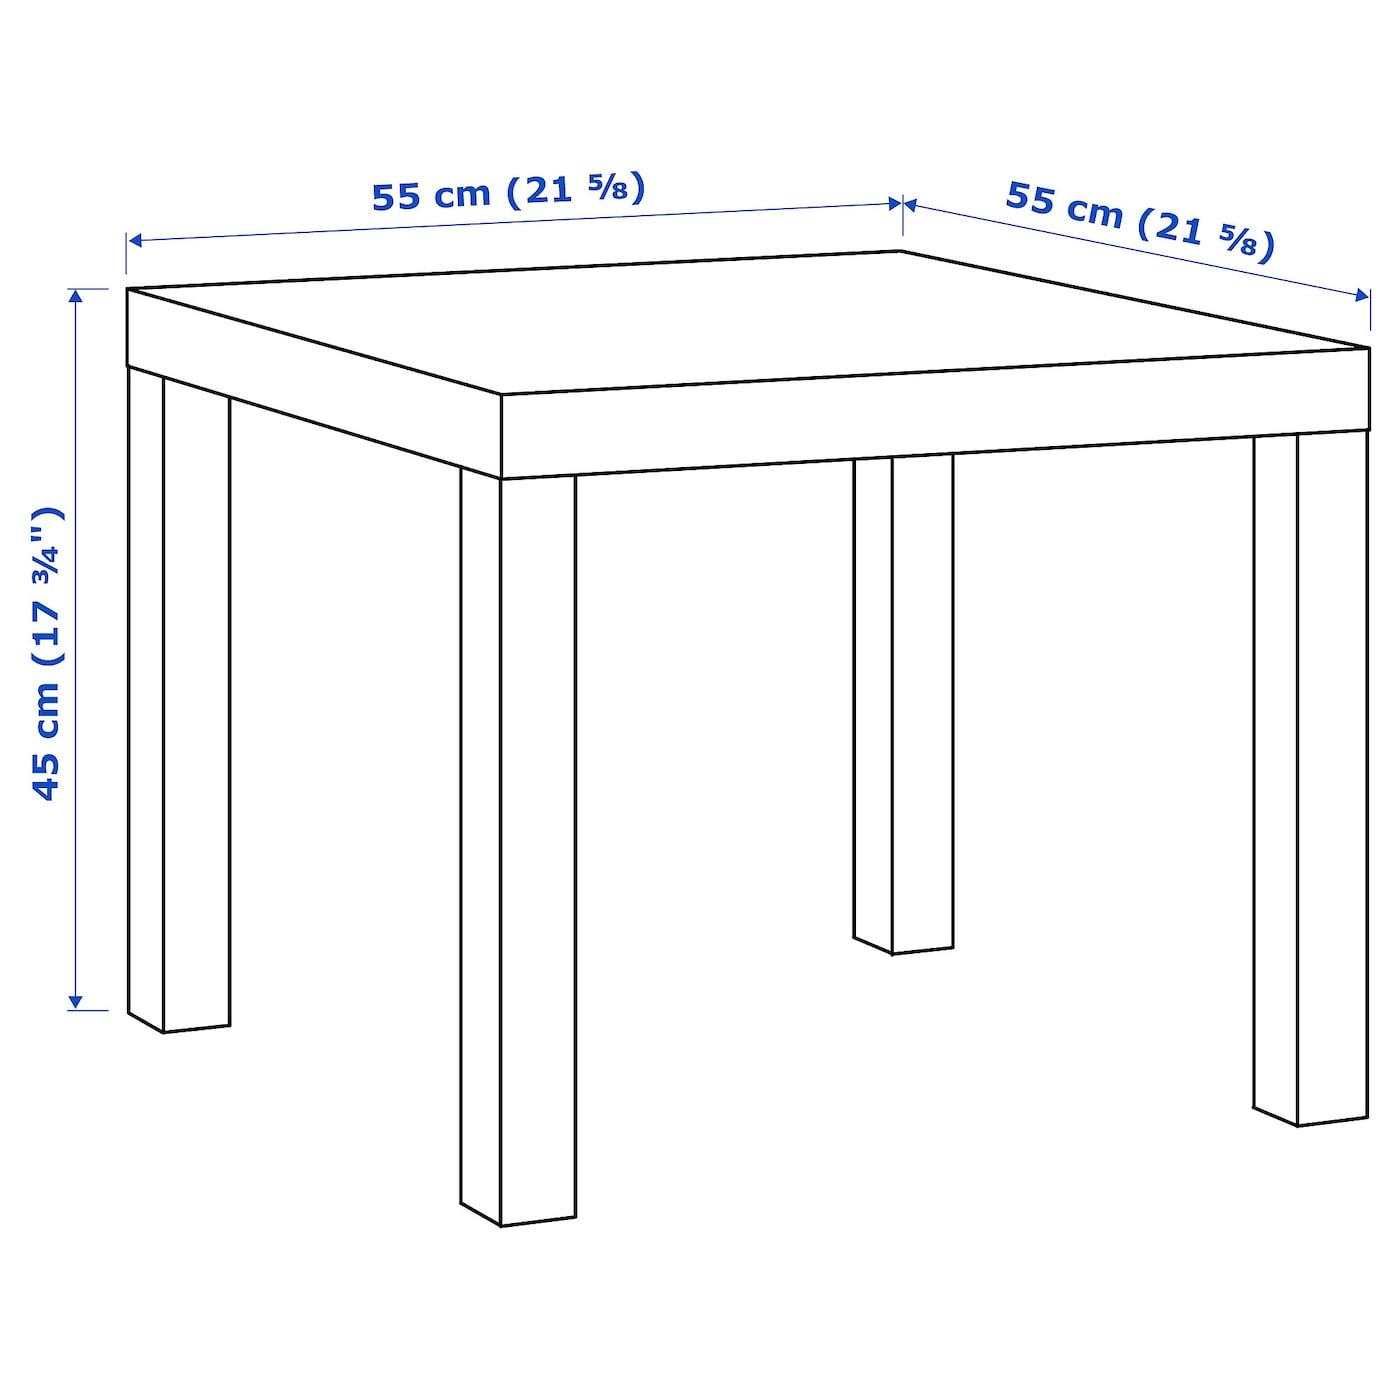 Ikea armoire table de salon table table basse table d/'appoint table blanc 55x55cm NEUF